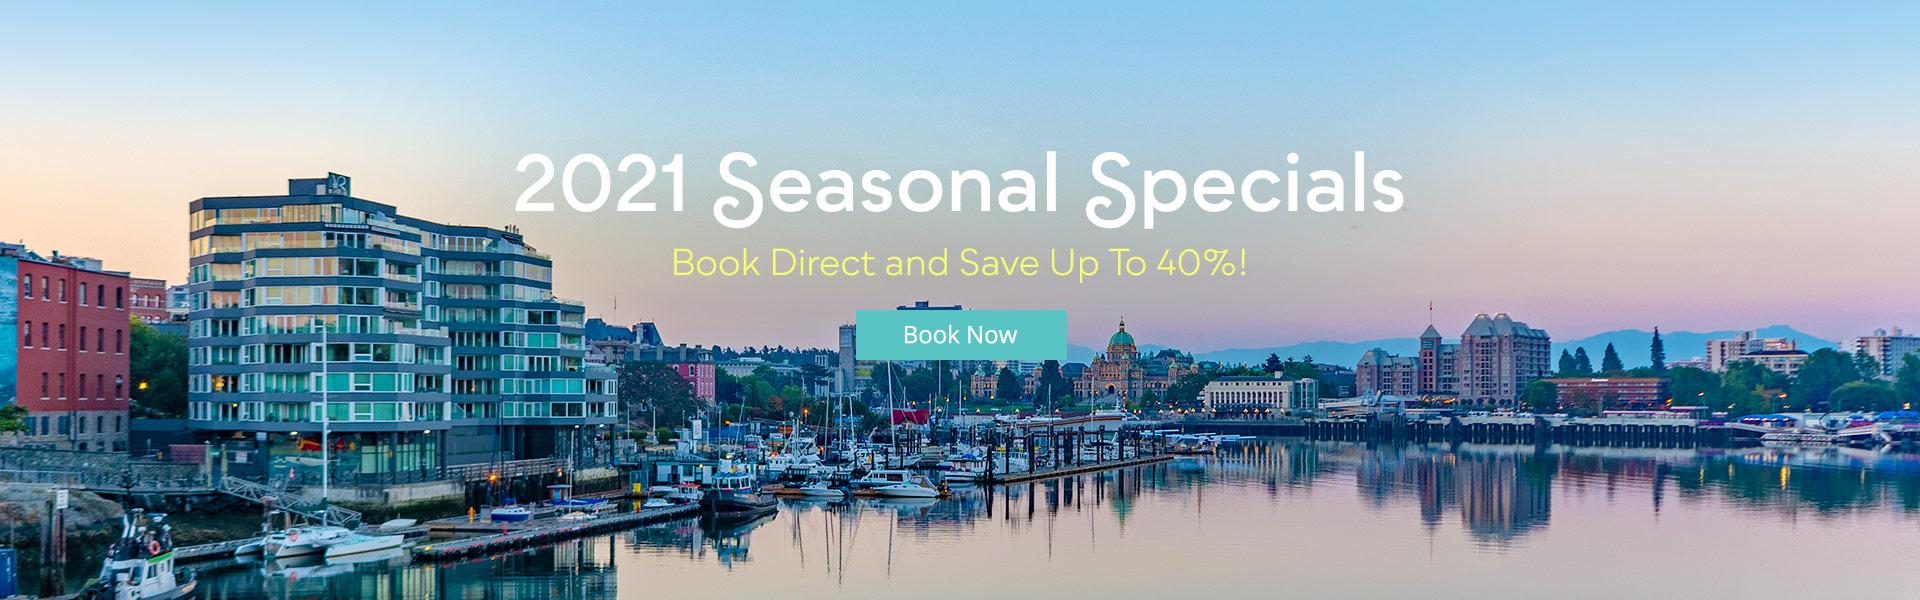 Victoria Regent Waterfront Hotel & Suites - 2021 Seasonal Specials